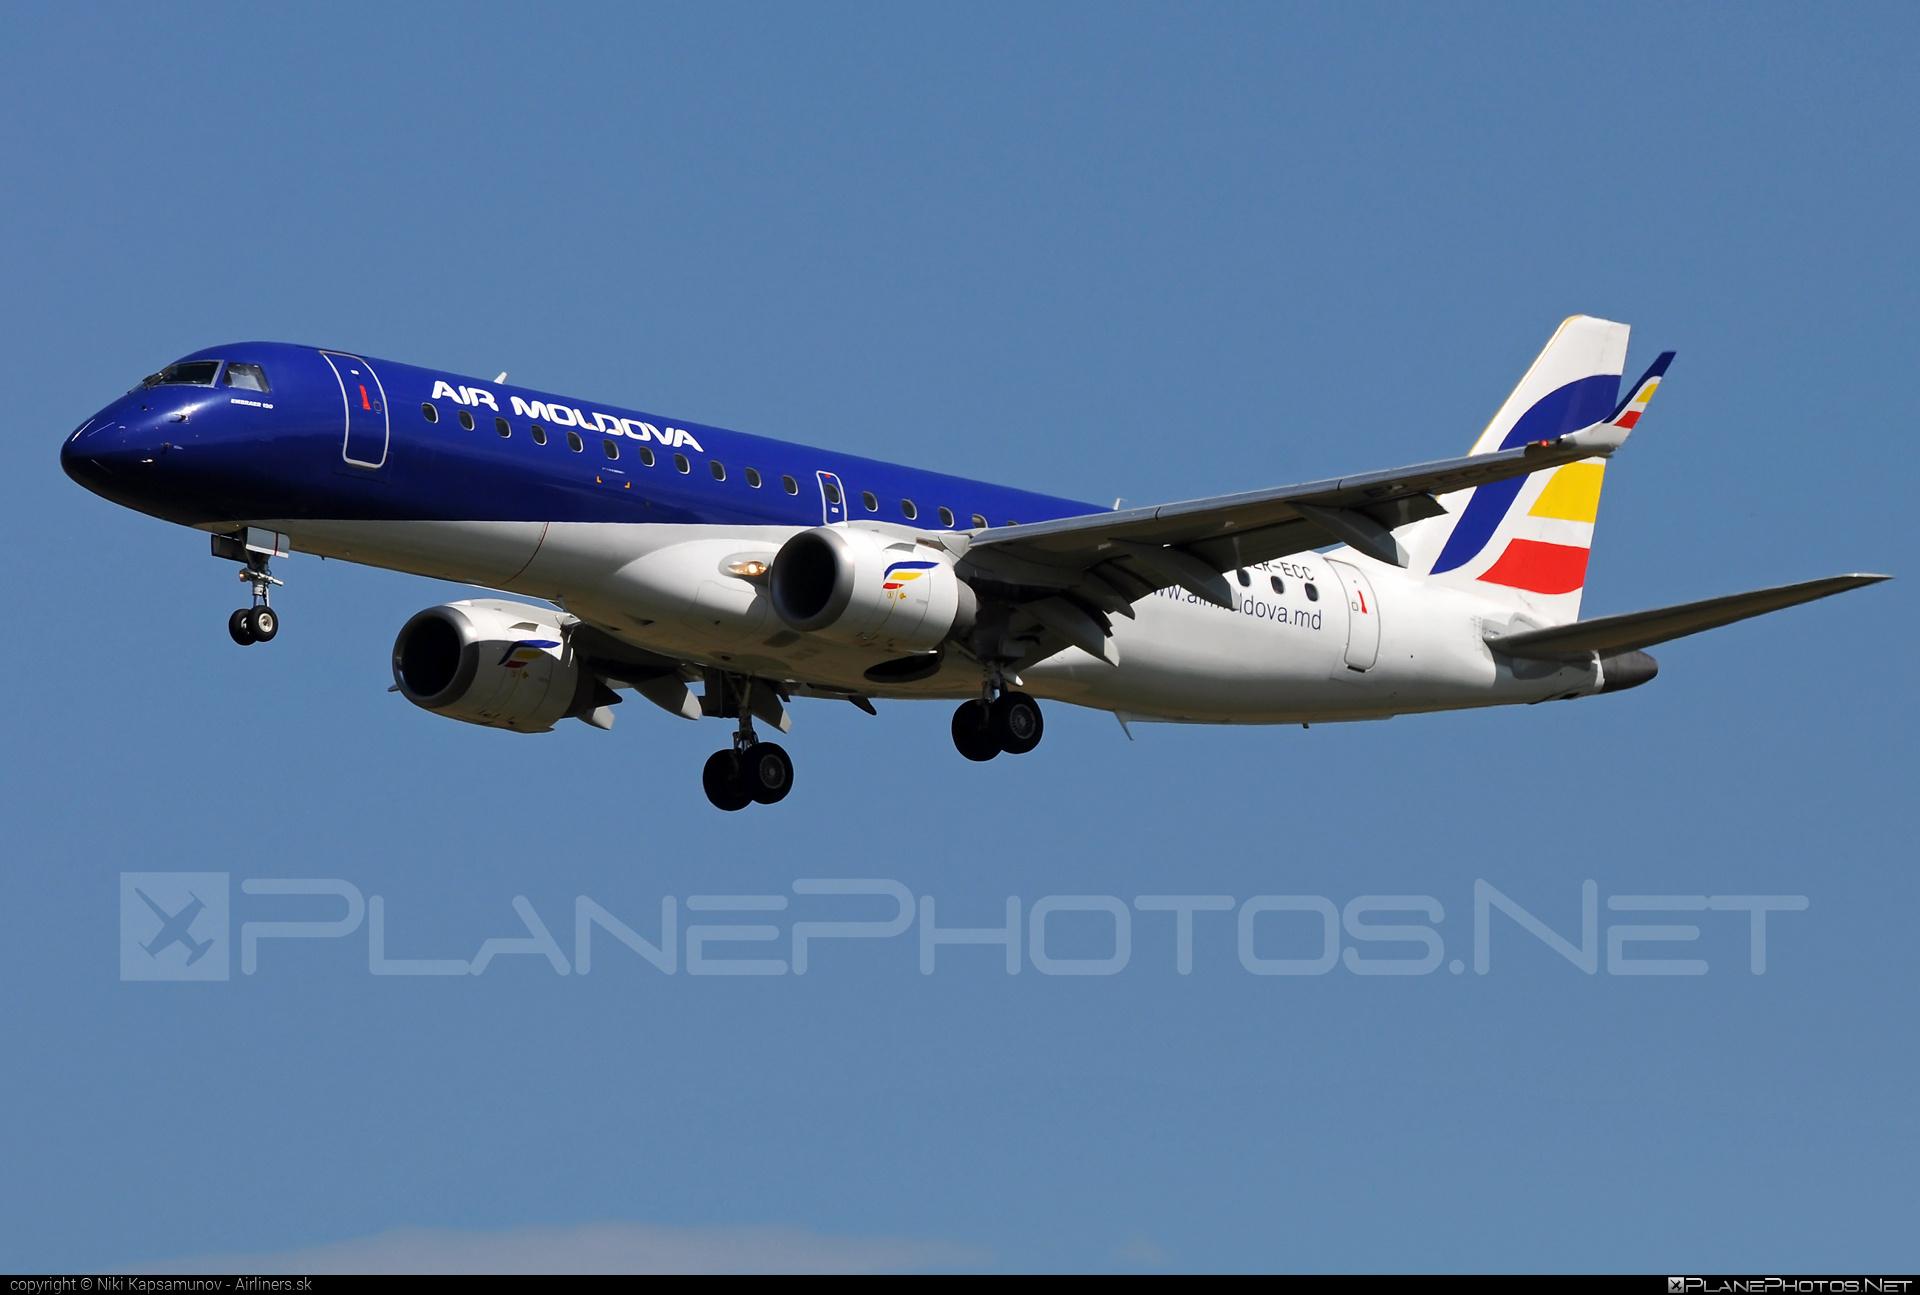 Embraer E190IGW (ERJ-190-100IGW) - ER-ECC operated by Air Moldova #e190 #e190100 #e190100igw #e190igw #embraer #embraer190 #embraer190100igw #embraer190igw